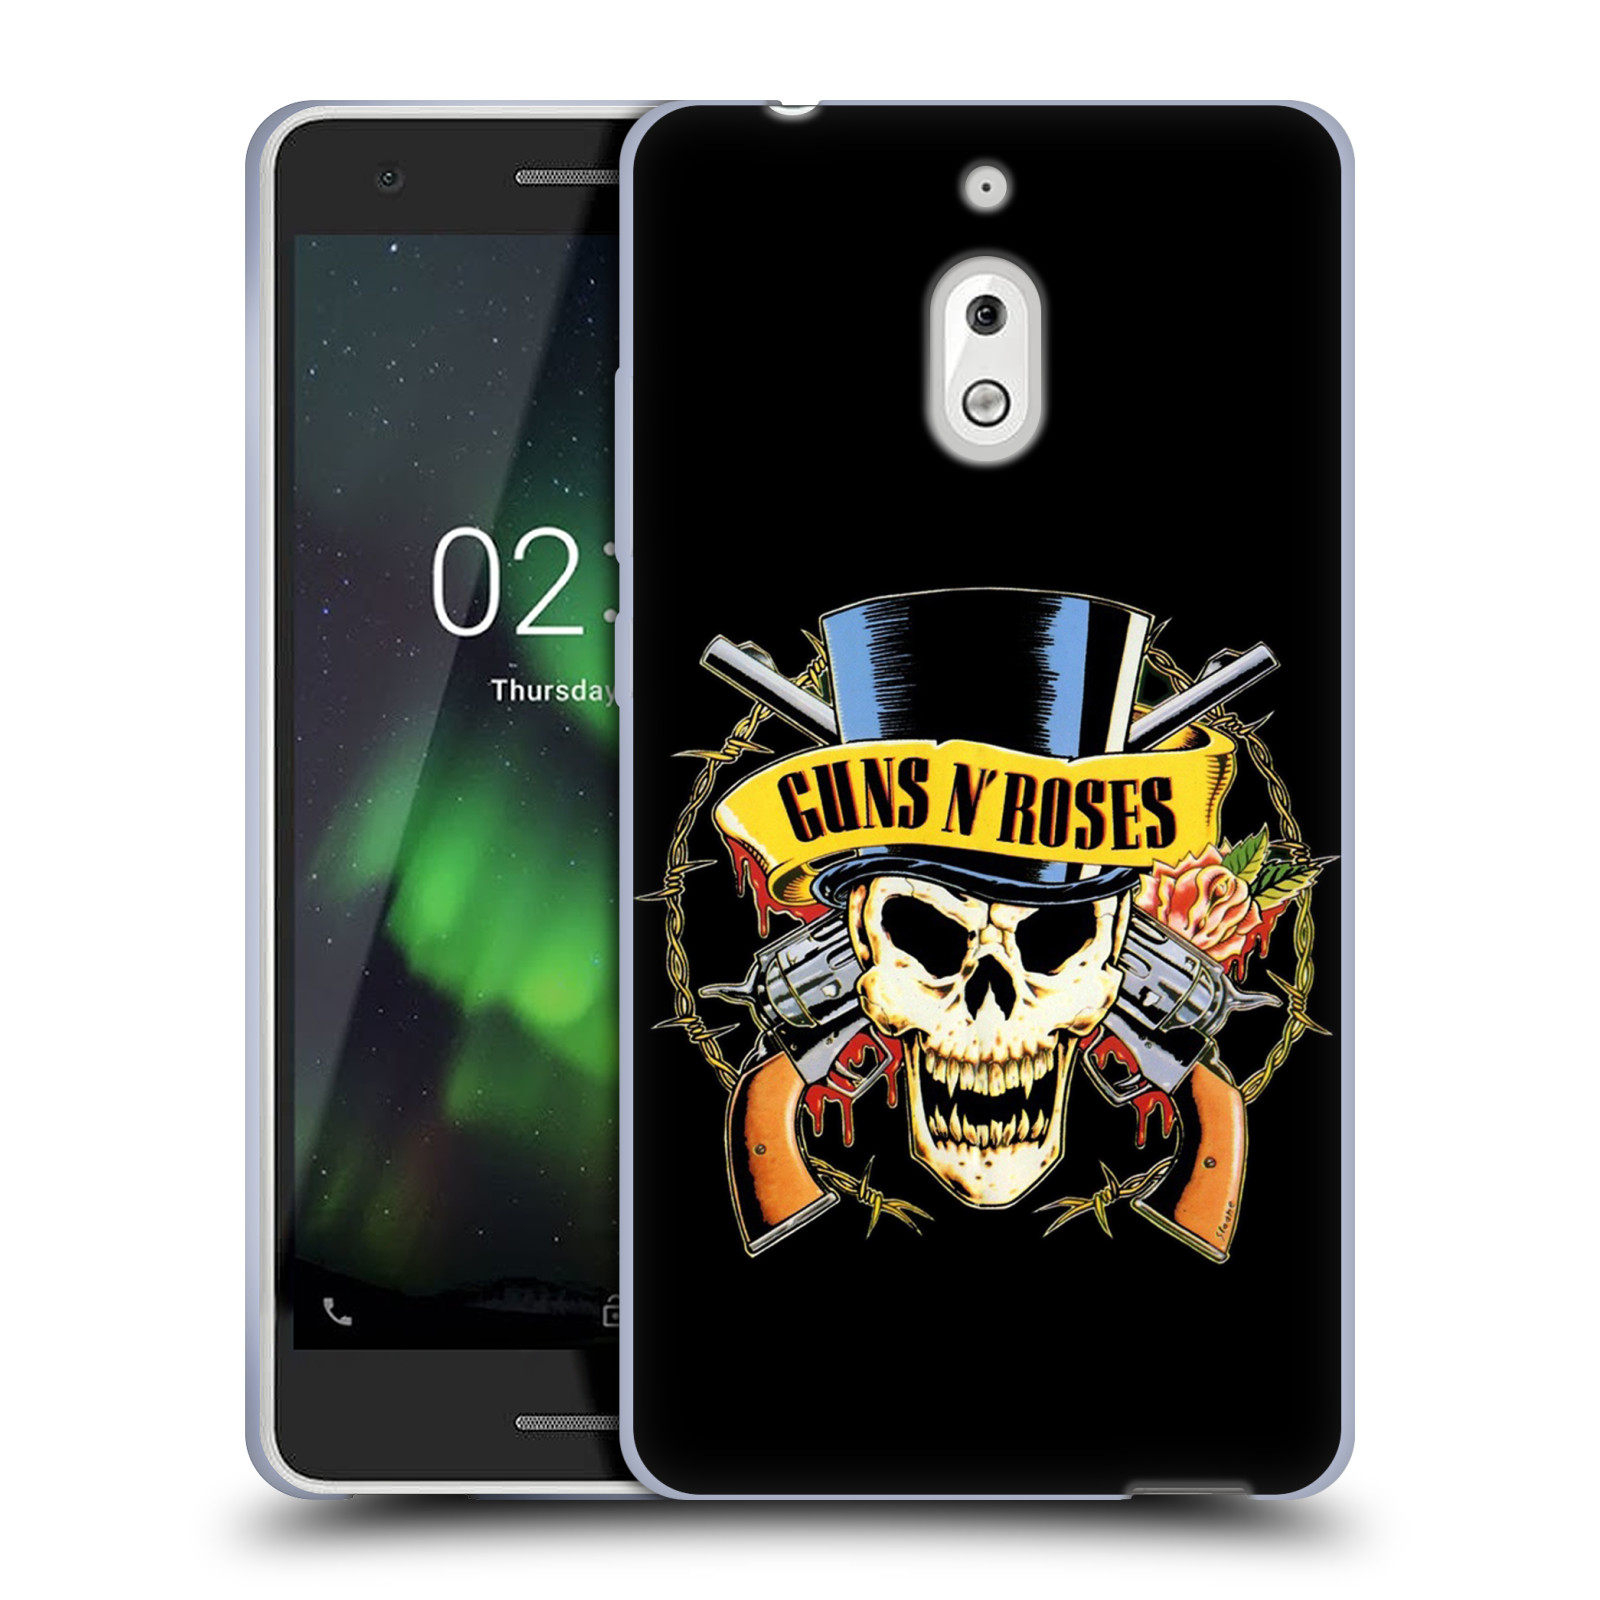 Silikonové pouzdro na mobil Nokia 2.1 - Head Case - Guns N' Roses - Lebka